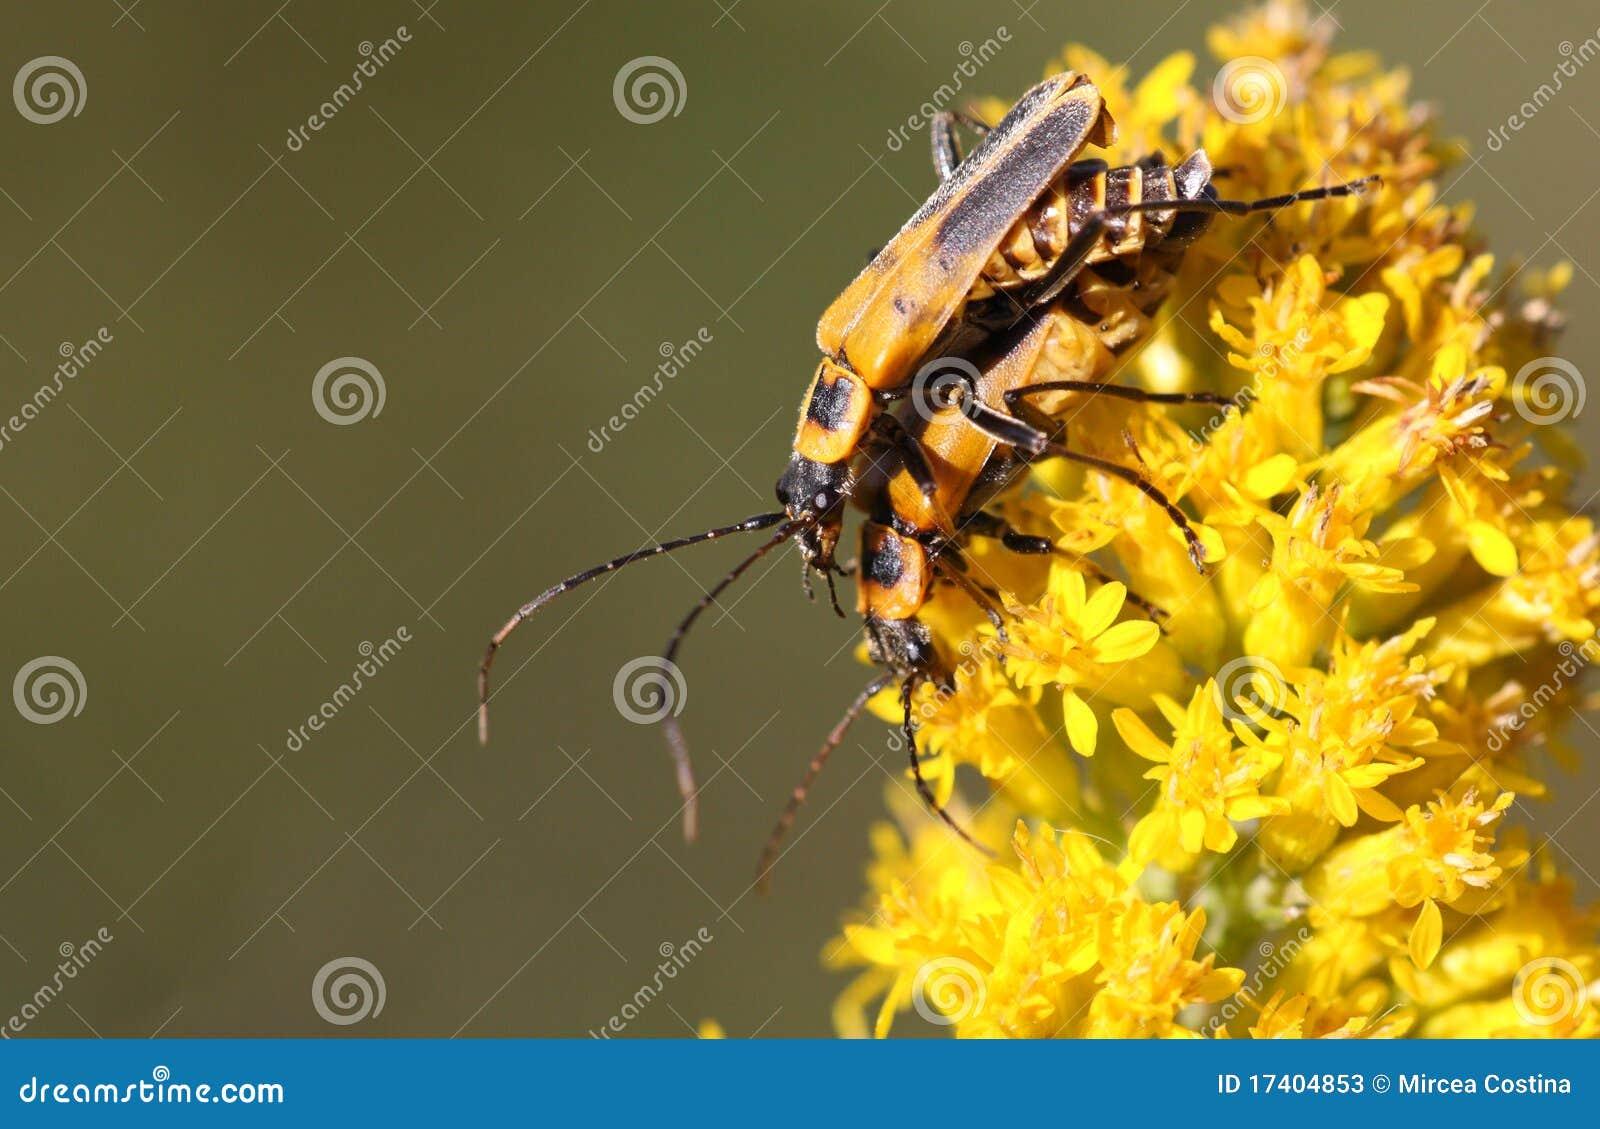 Goldenrod Soldier Beetle Chauliognathus pensylvanicus  mate Goldenrod Soldier Beetle